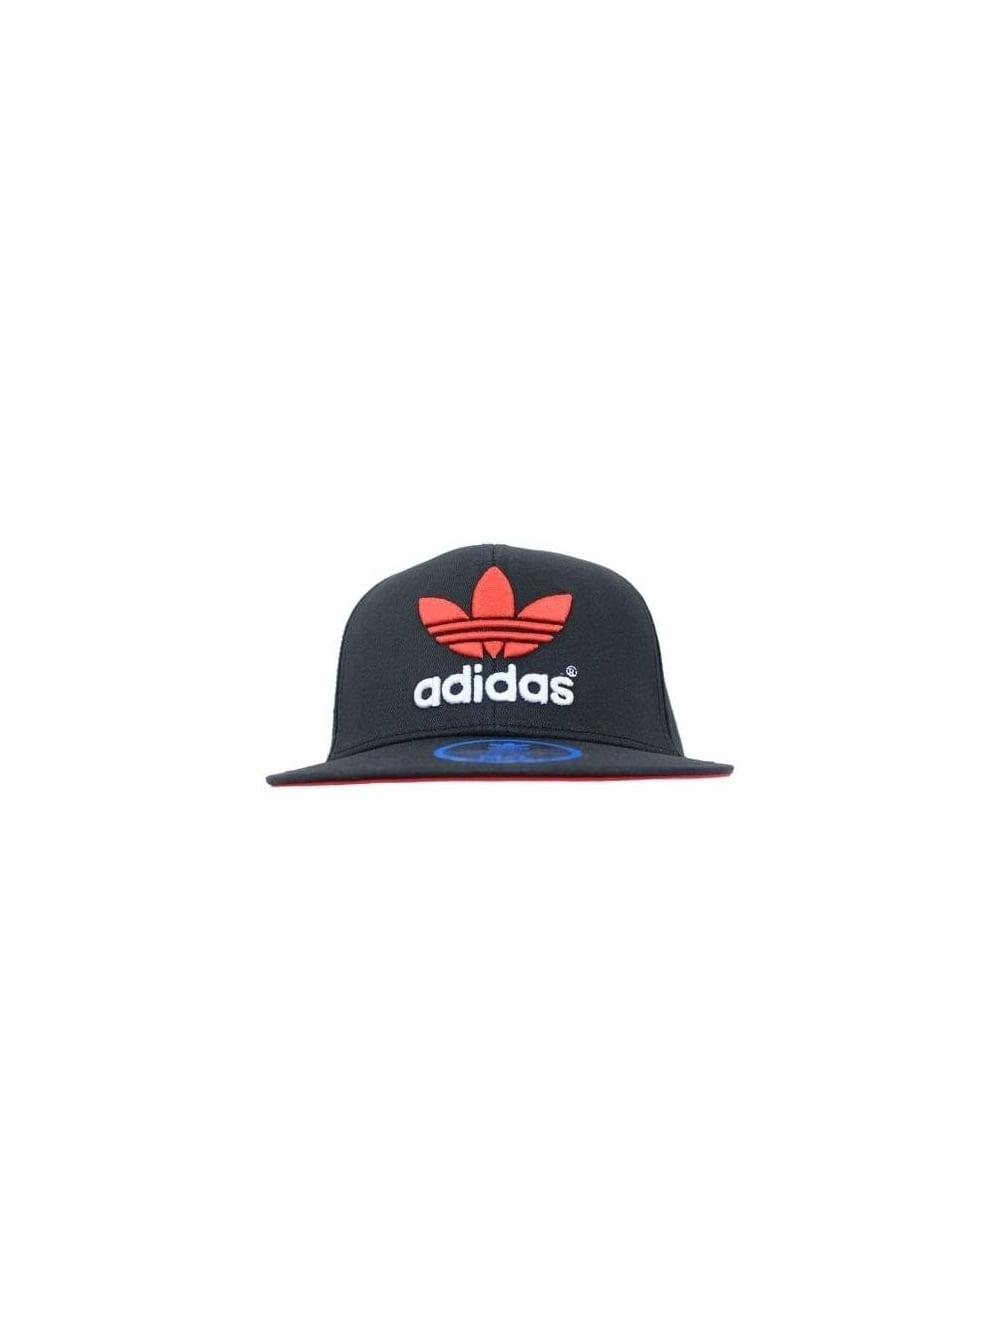 AC Flat Cap Snapback - Black/Red